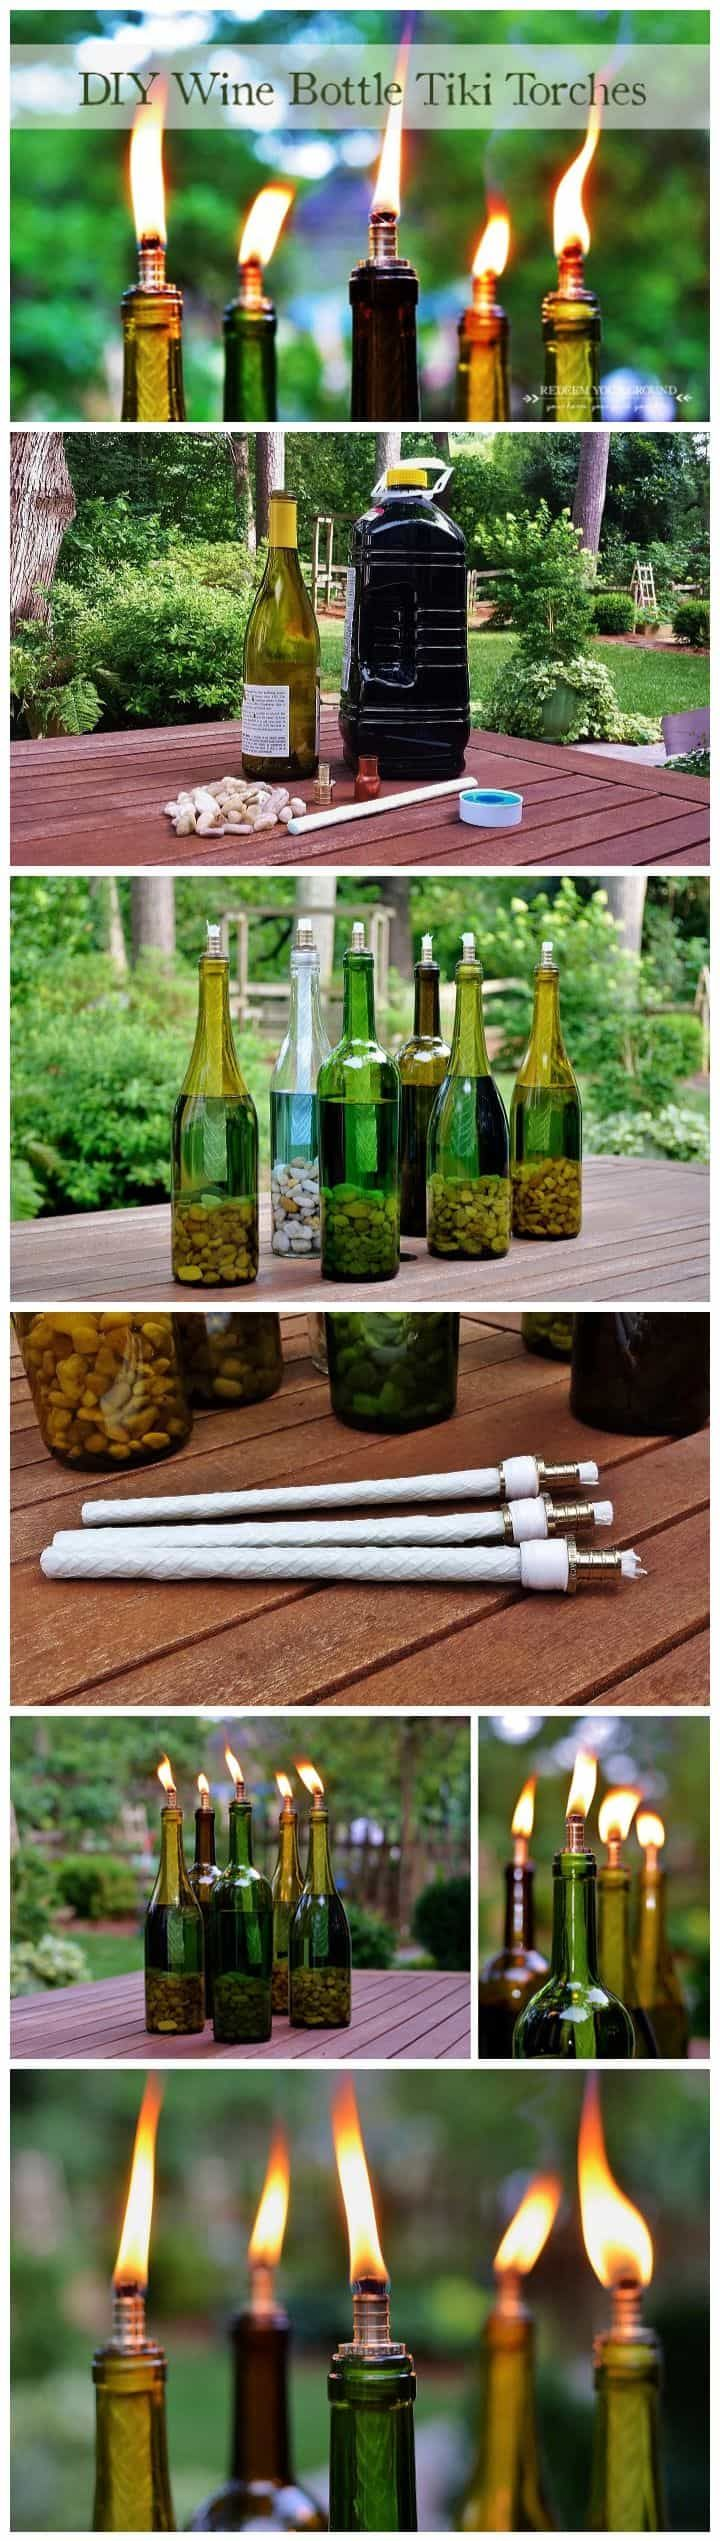 Best 25+ Wine bottle torches ideas on Pinterest | Torches, Bottle tiki torch  diy and Wine bottle tiki torch